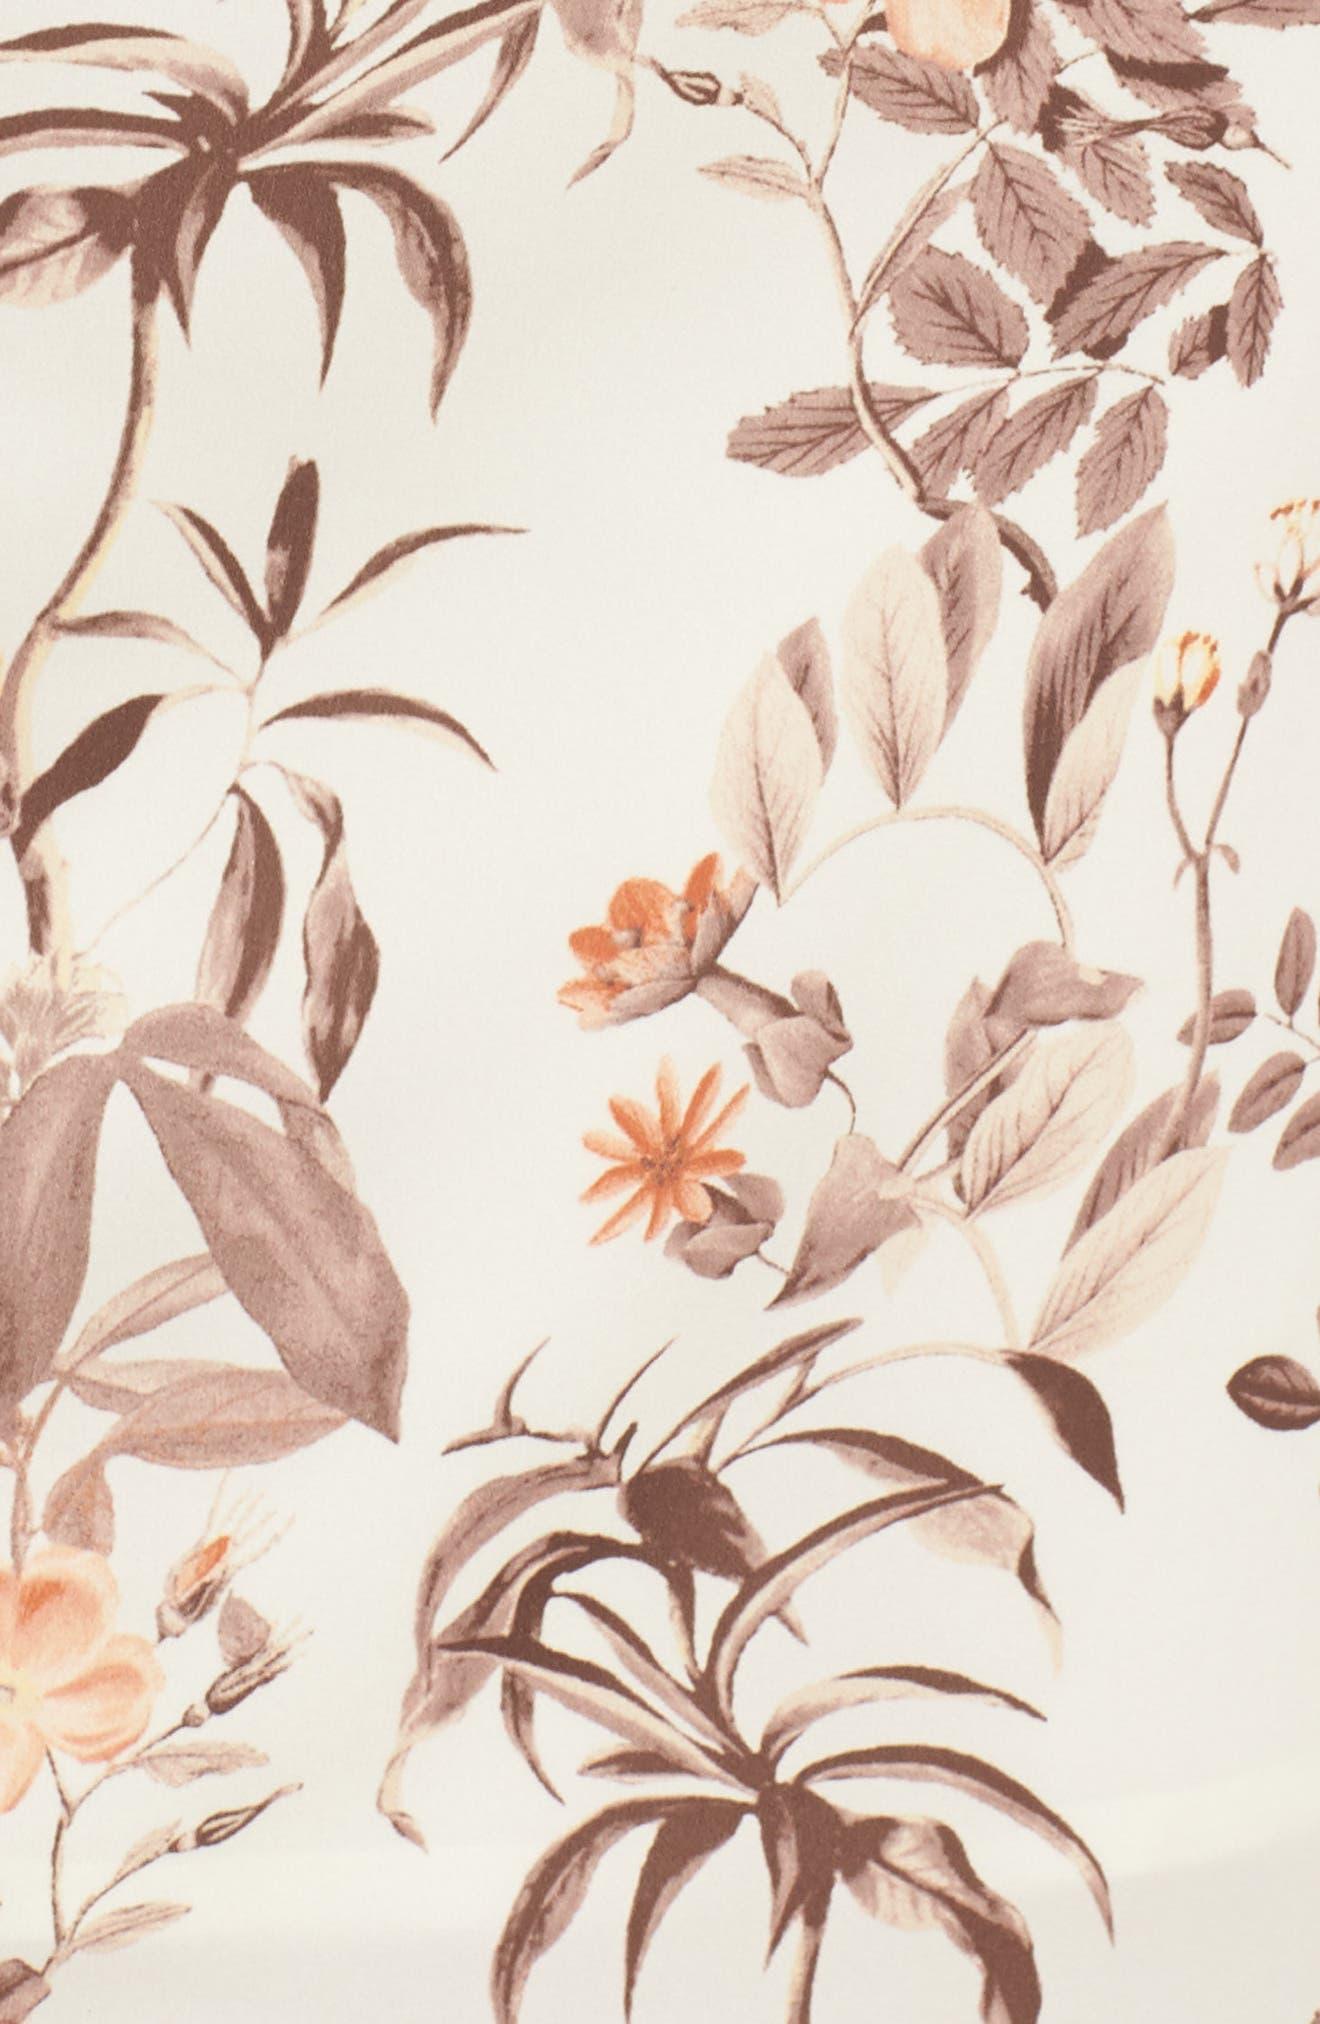 Lauren Botanical Garden Print Midi Dress,                             Alternate thumbnail 7, color,                             Beige/ Orange